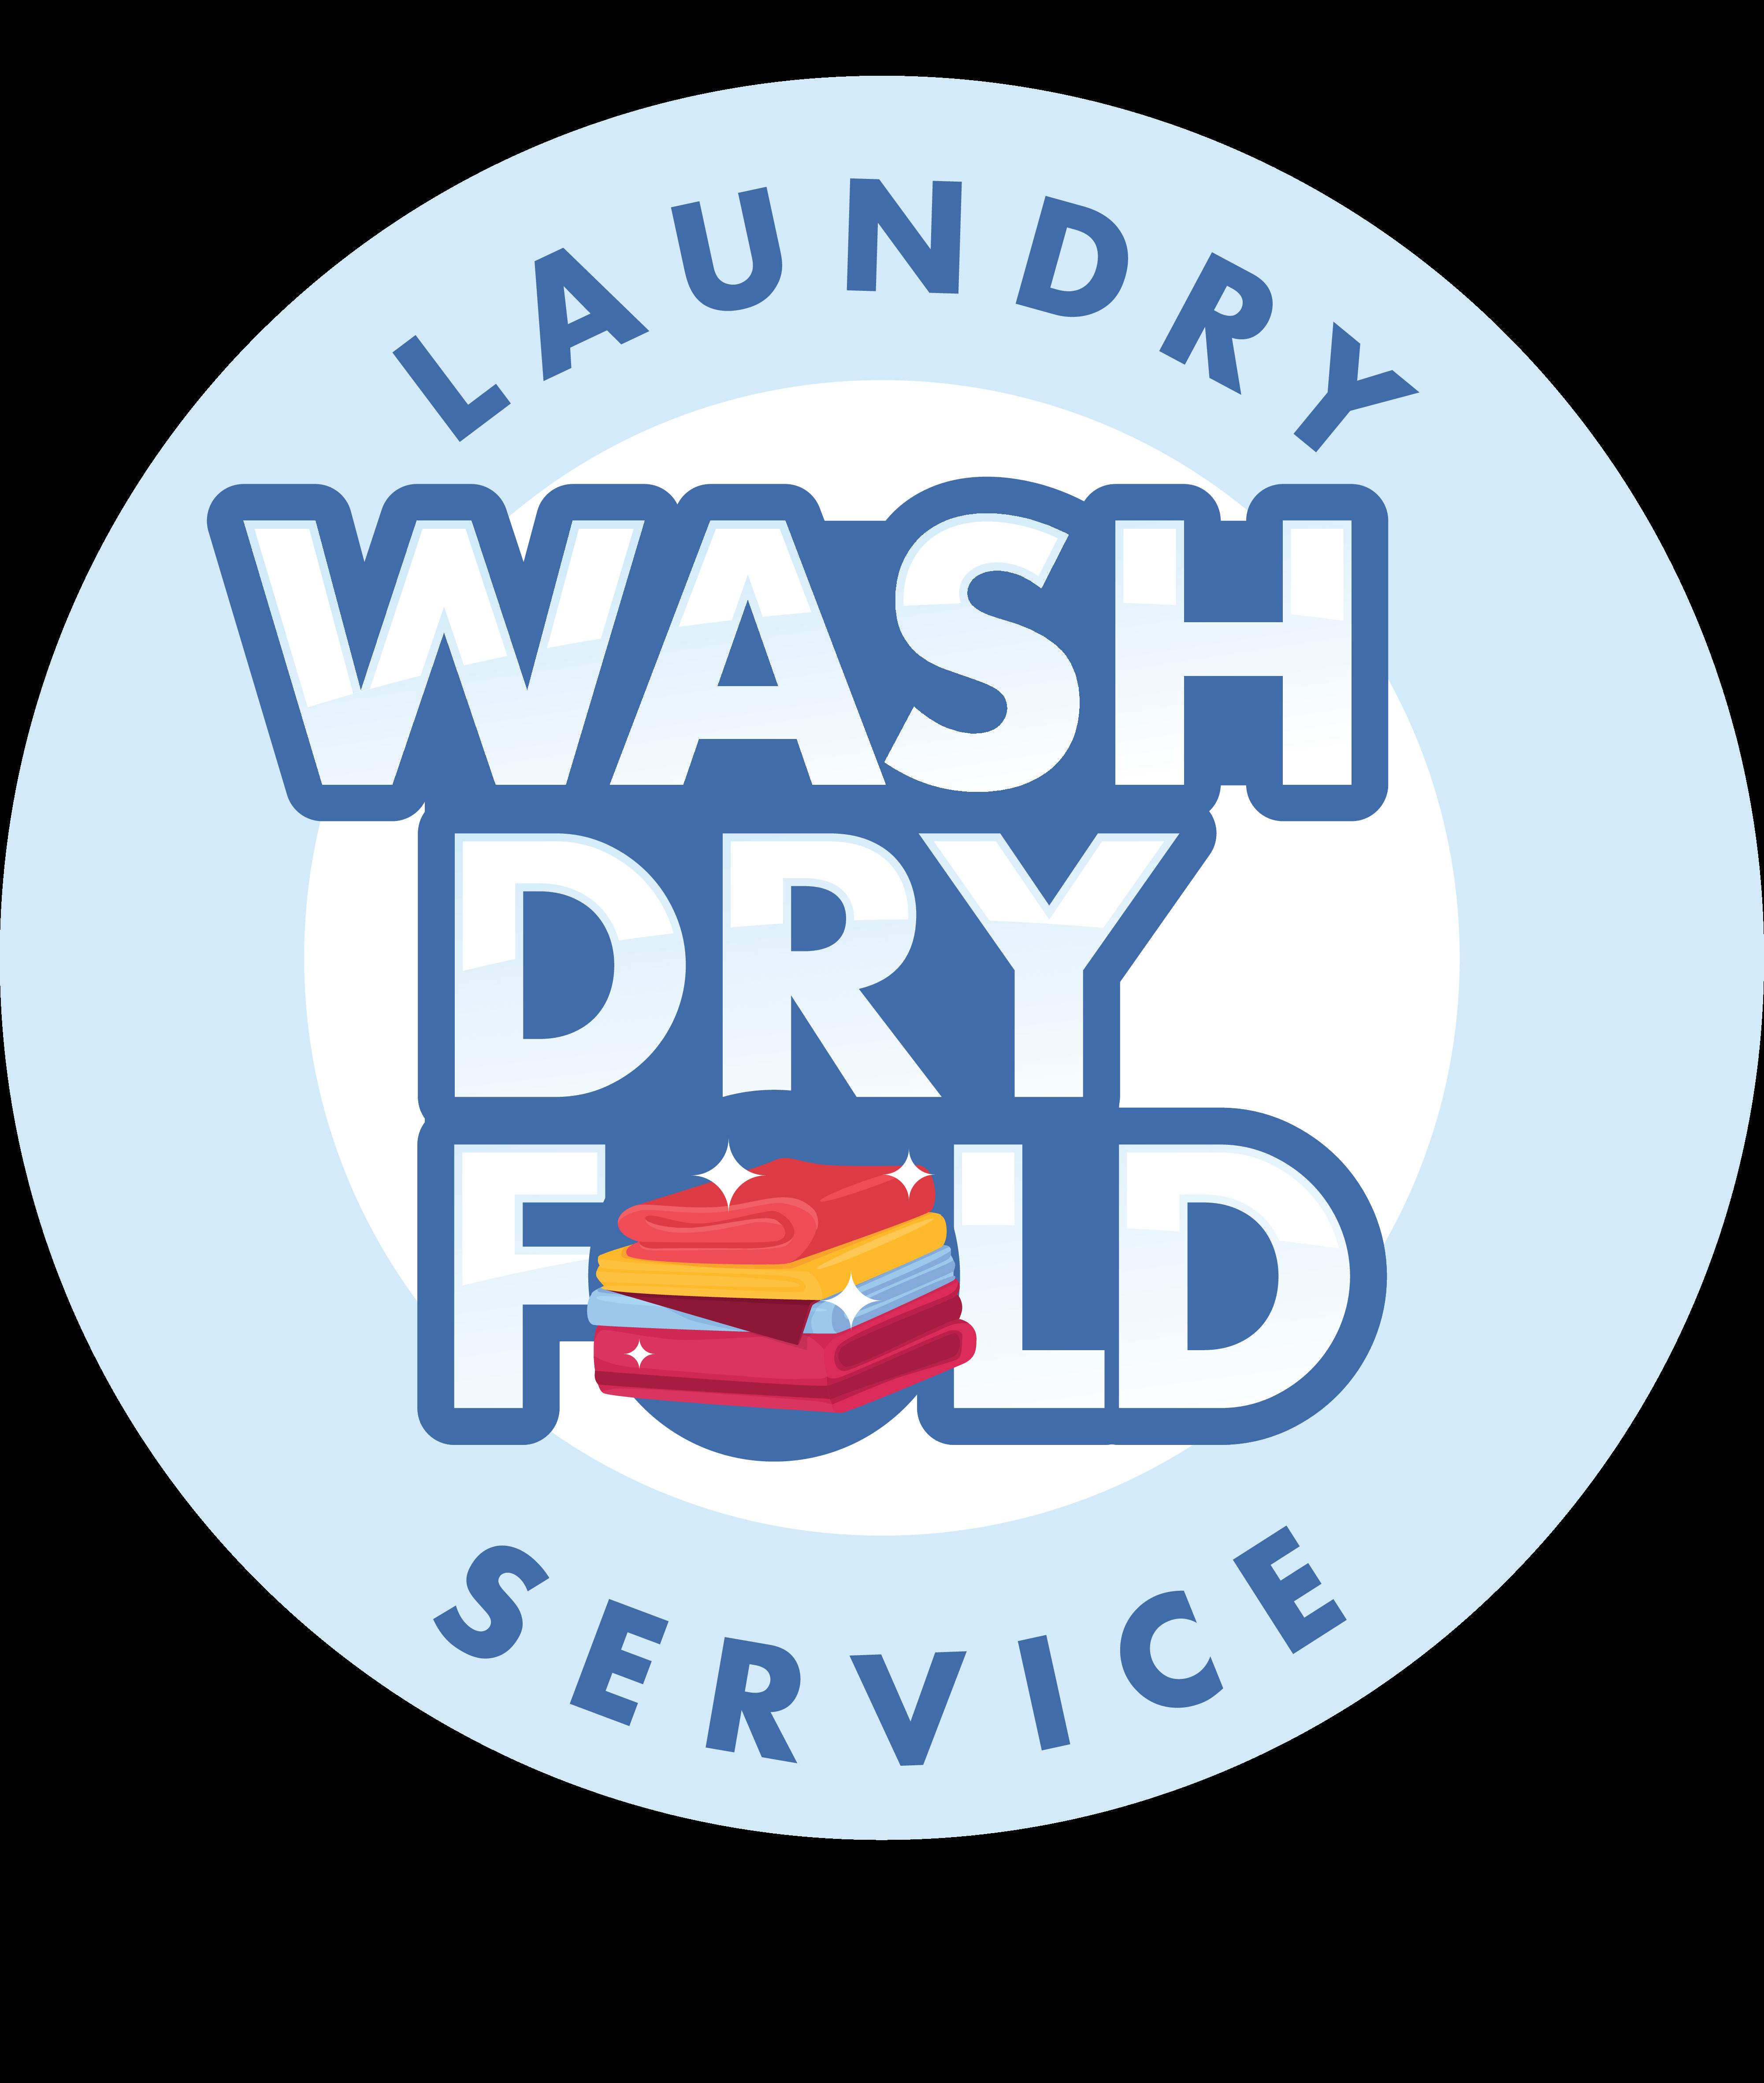 CL Laundry Service